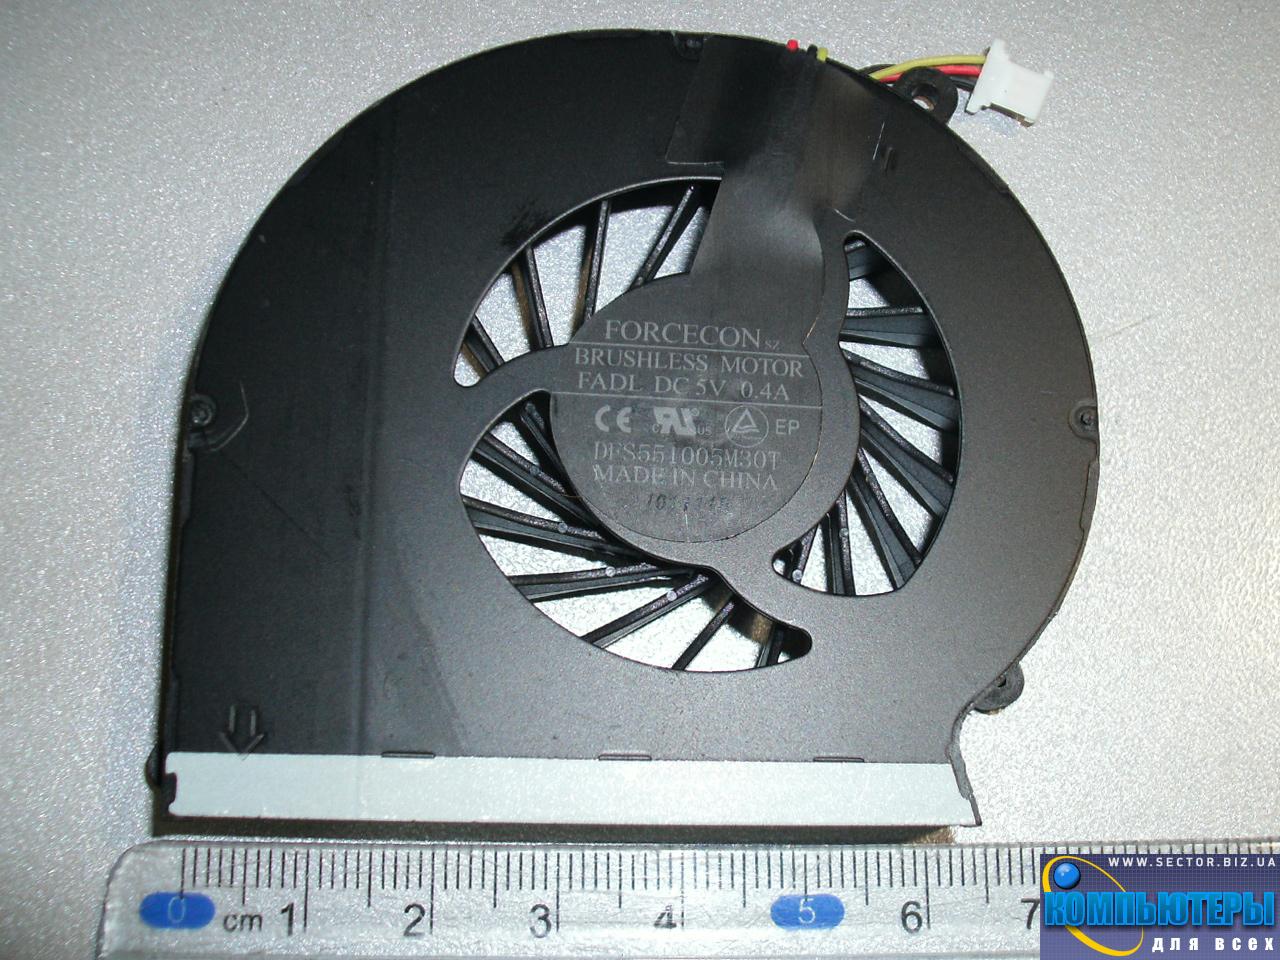 Кулер к ноутбуку HP Compaq CQ43 CQ57 CQ631 CQ635 G57 G43  430 431 435 436 630 p/n: DFS551005M30T FADL. Фото № 2.